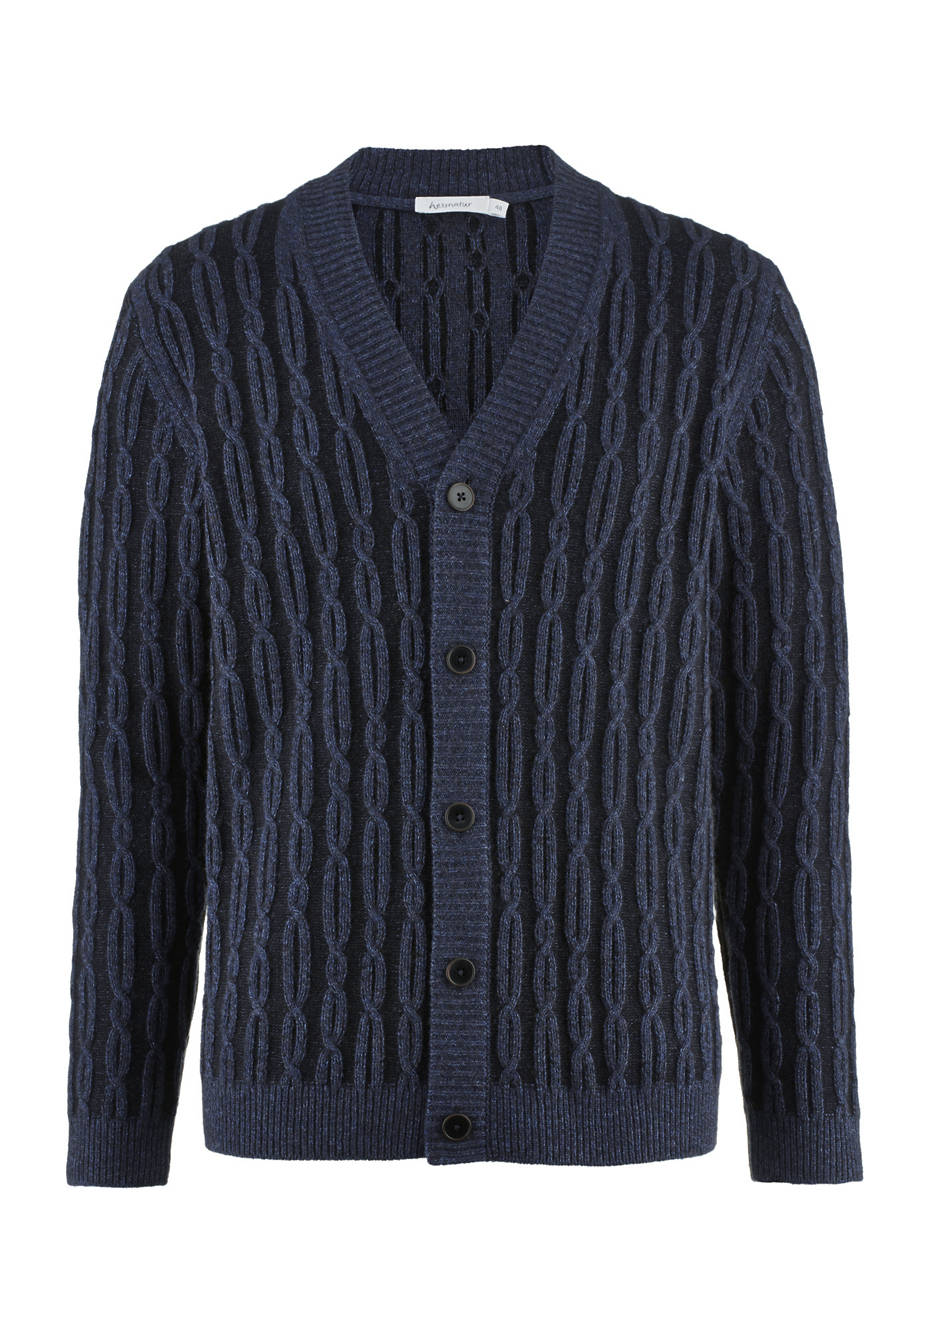 Cardigan made of organic cotton, virgin wool and yak wool